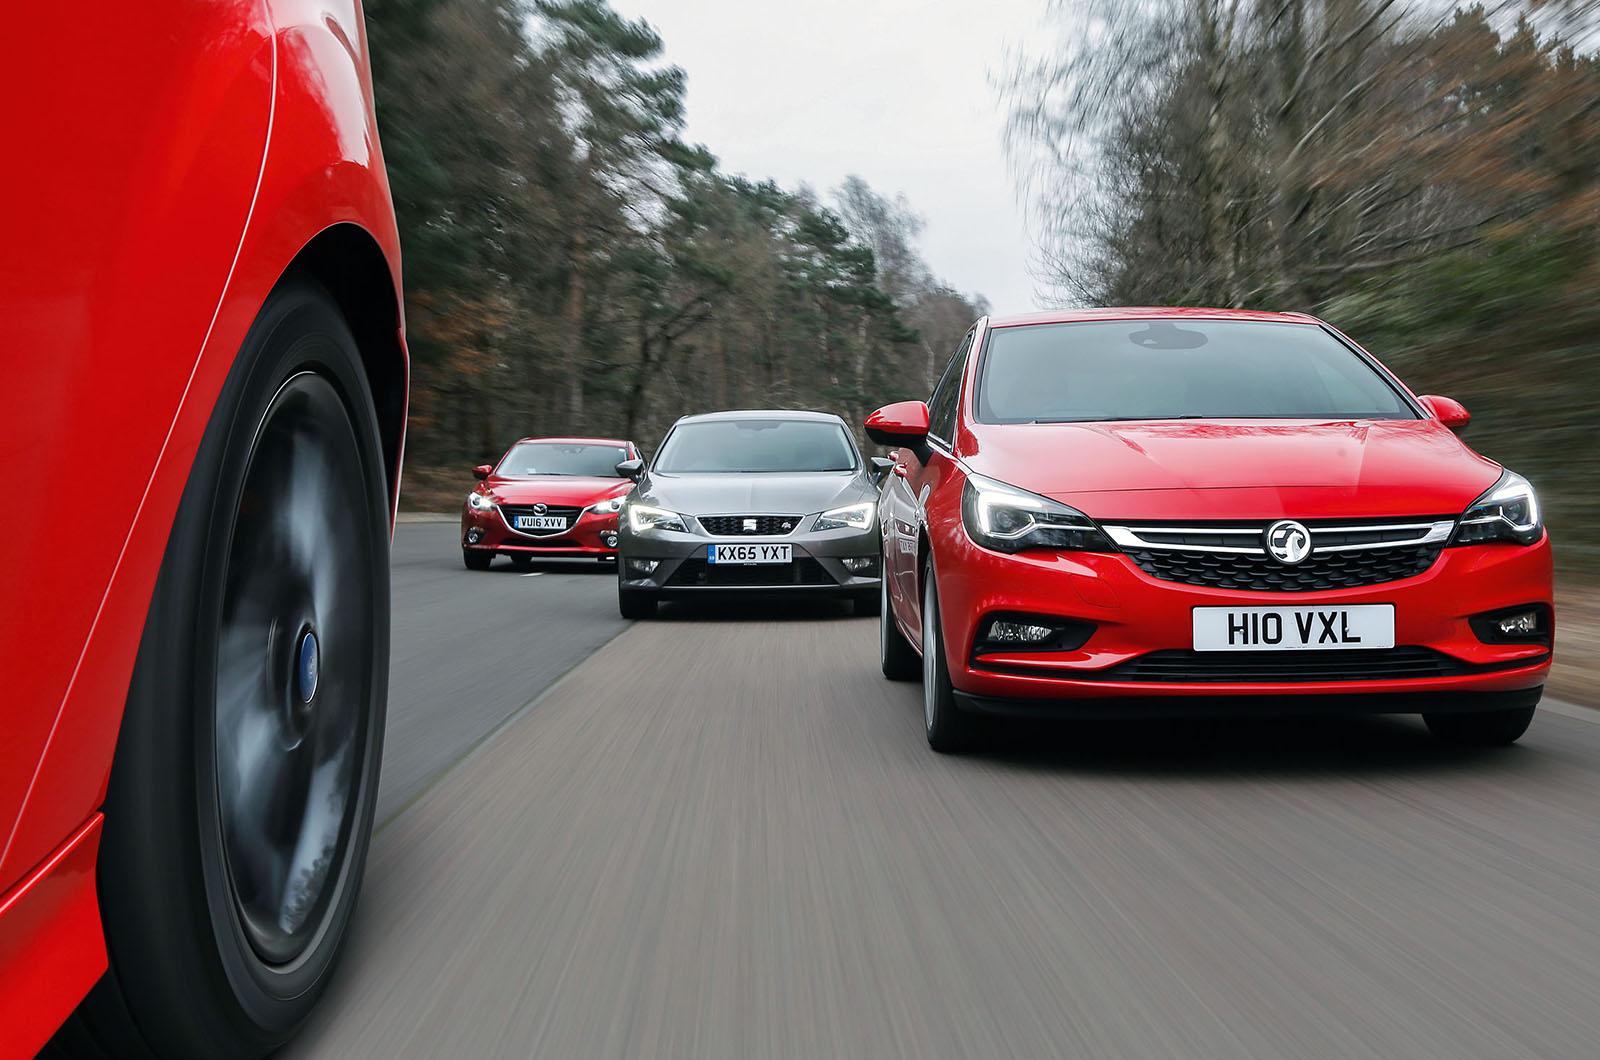 Seat Leon Ford Focus Vauxhall Astra Versus Mazda 3 Warm Hatch Group Test Autocar